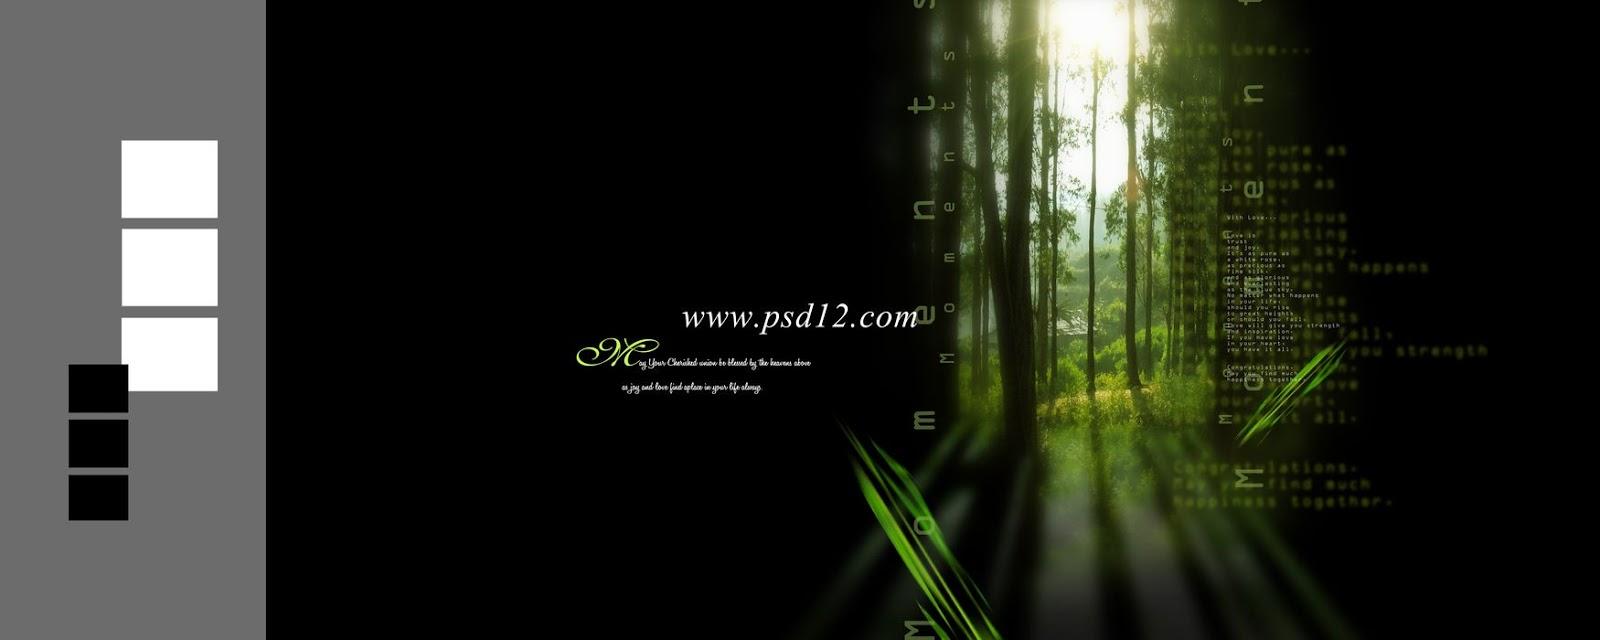 Karizma Background Psd | Joy Studio Design Gallery - Best ...